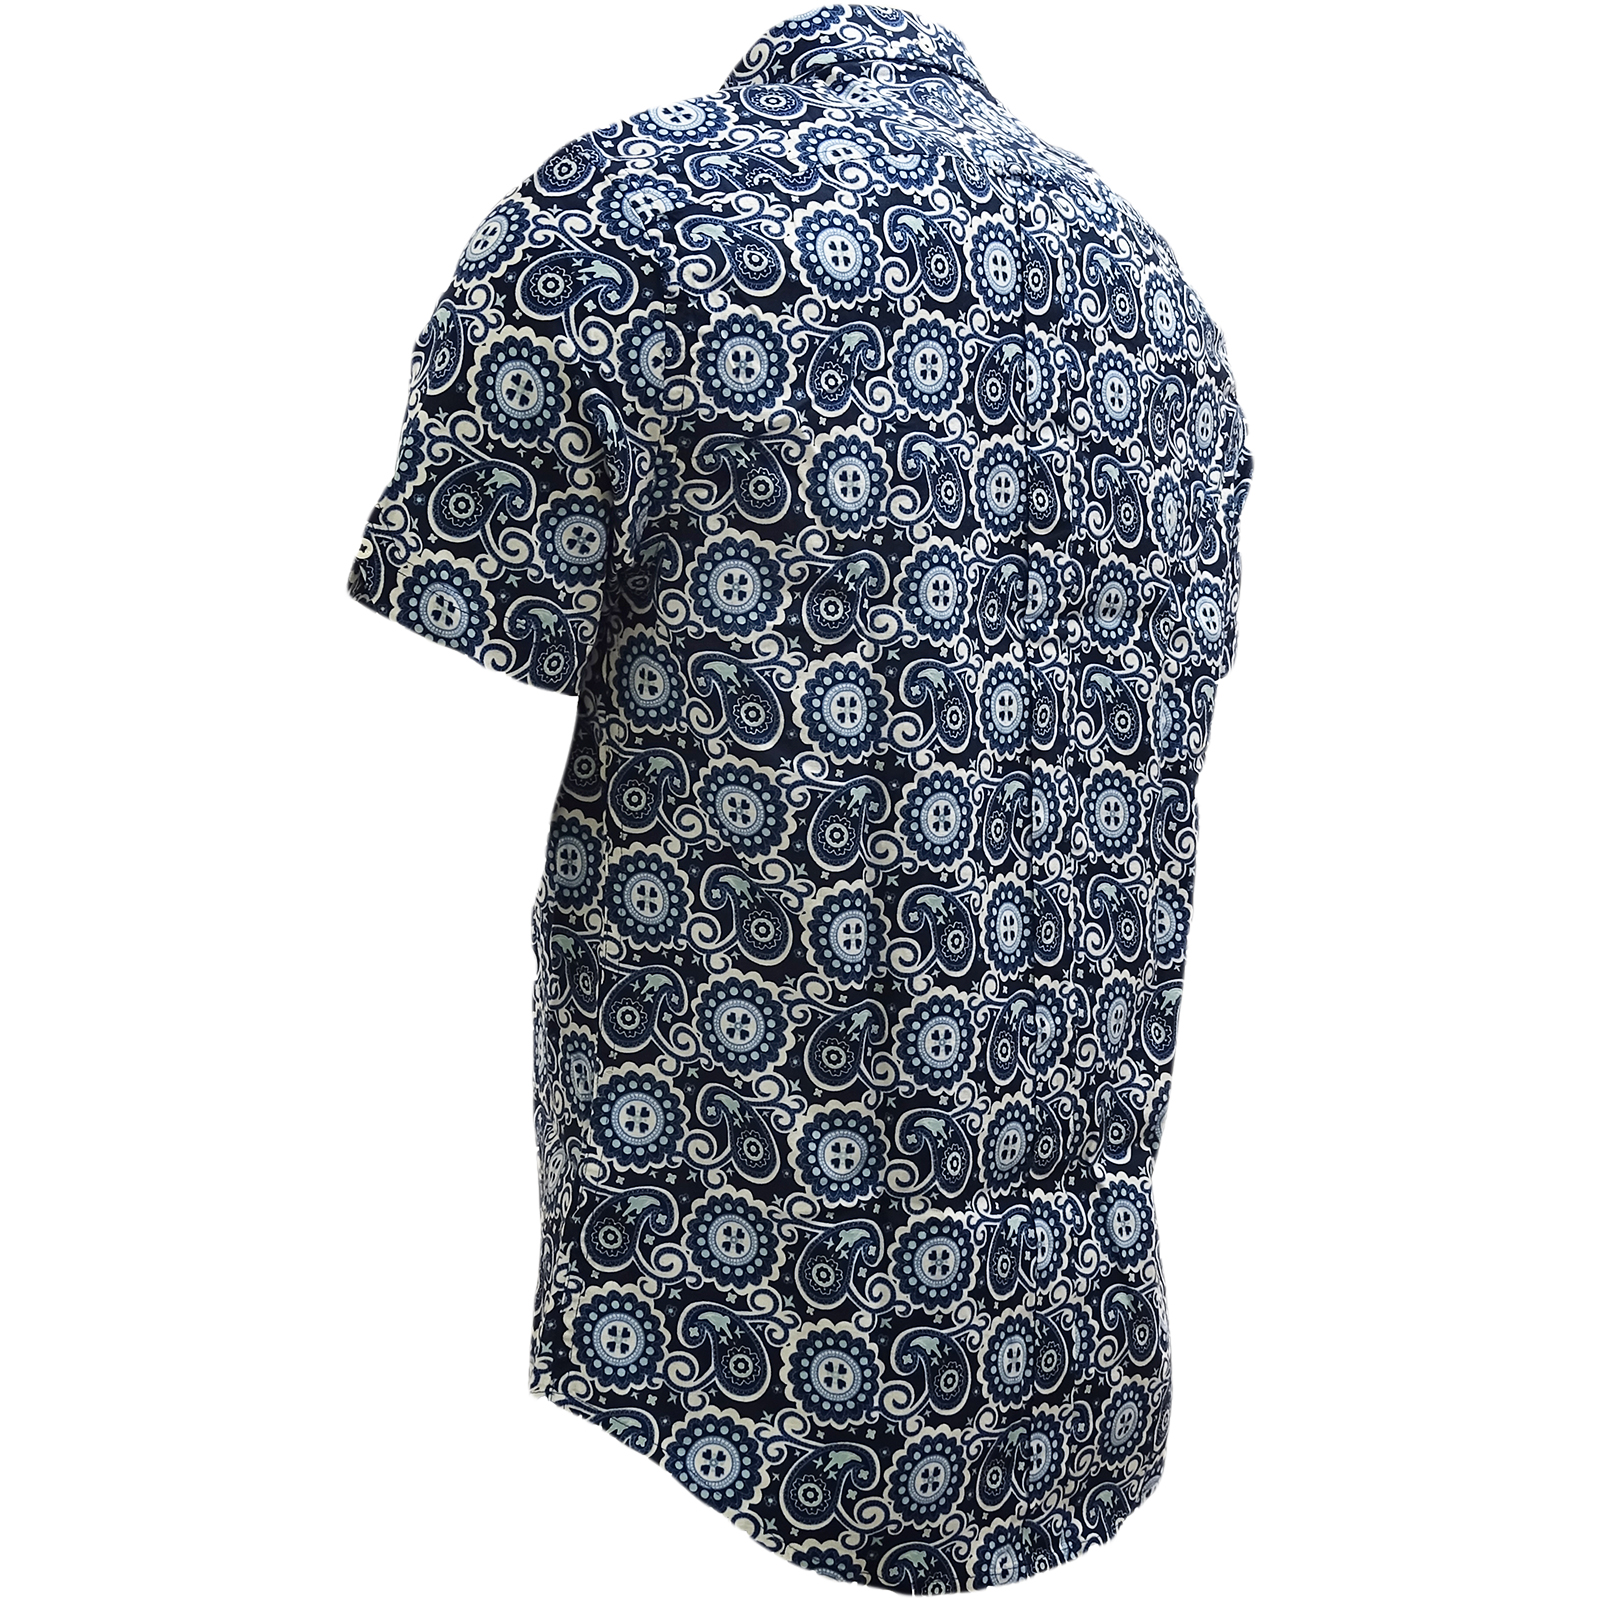 Ben Sherman Midnight Mod Retro Paisley Shirt - 54031 54031 54031 d8b431